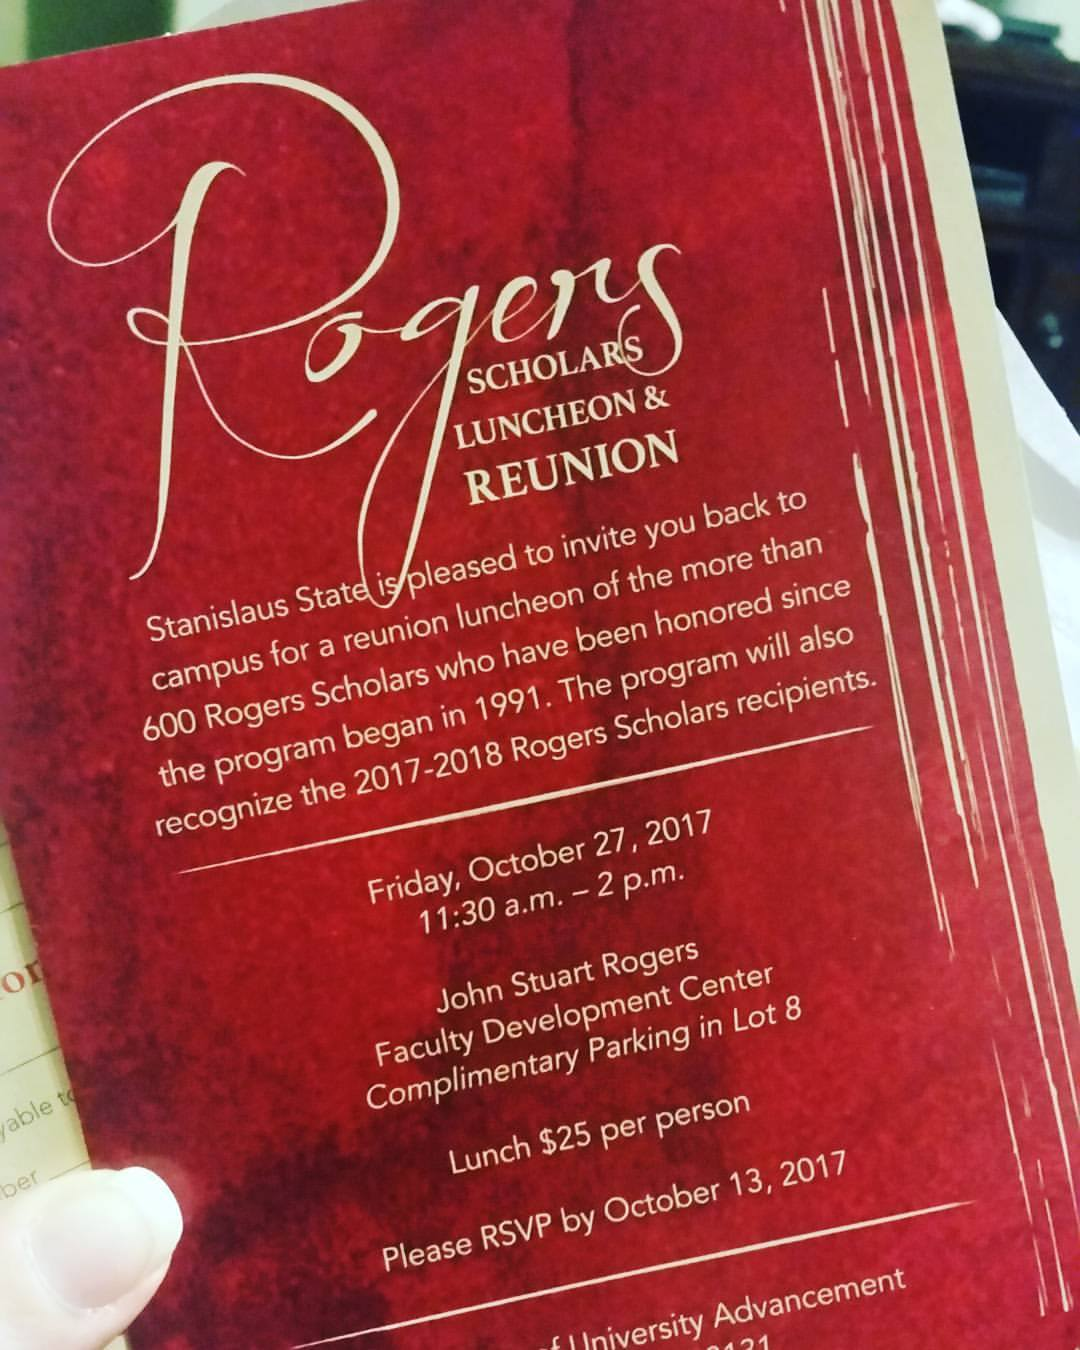 Rogers Scholars Luncheon & Reunion invitation